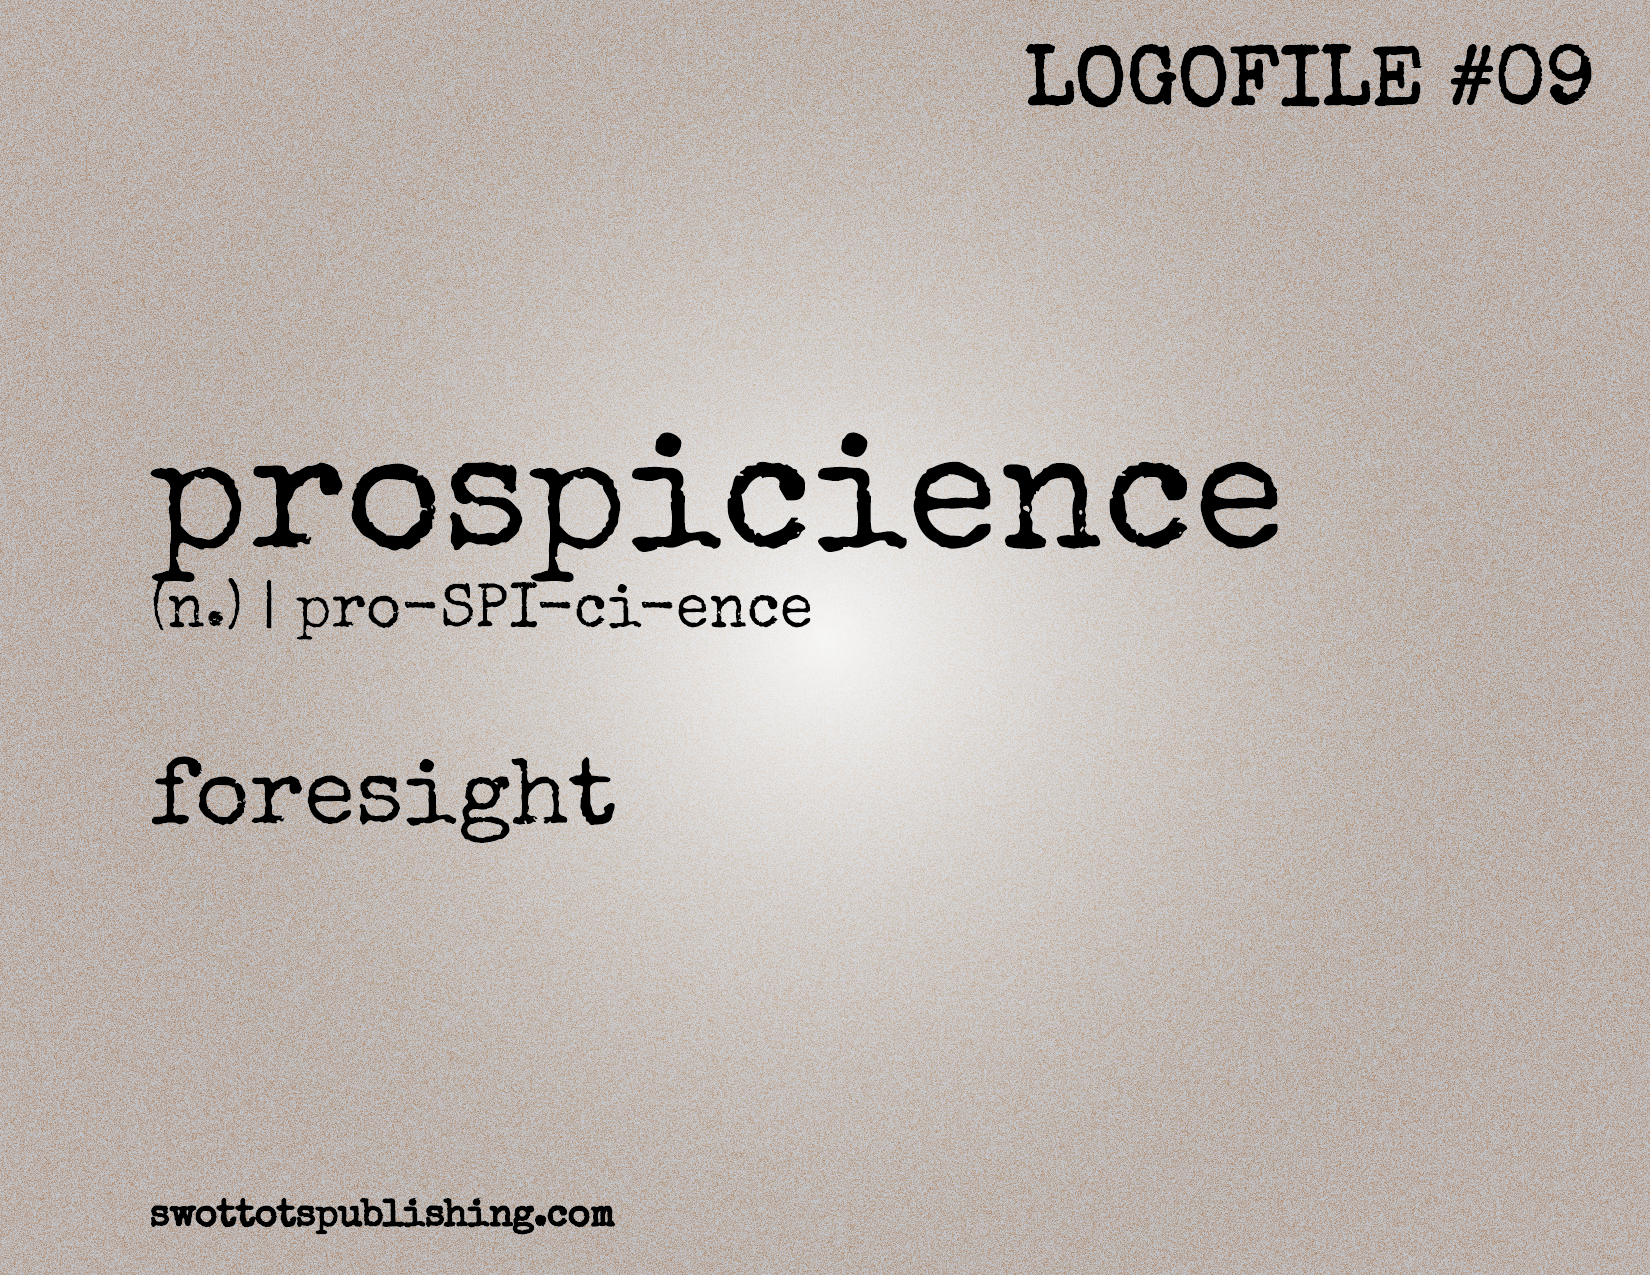 STP Logofile #09 | prospicience (n.)